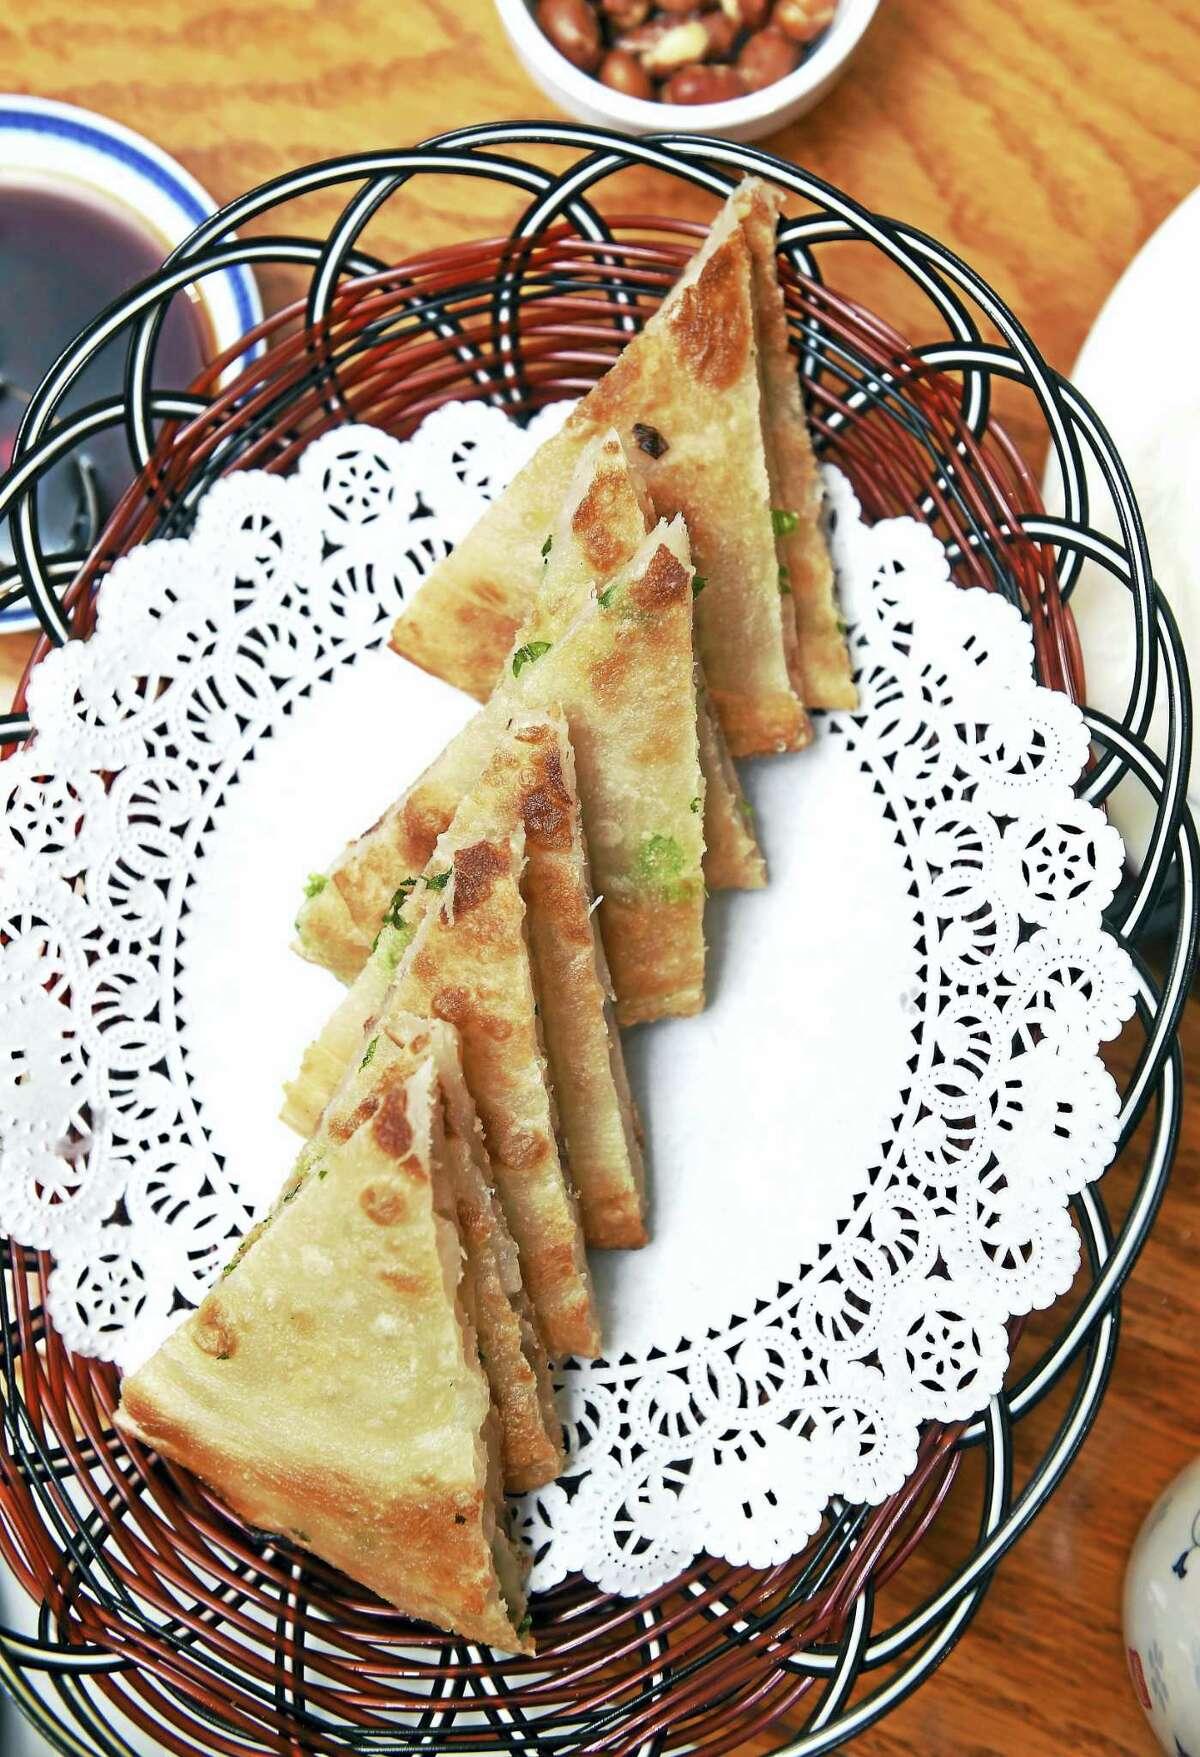 Scallion pancakes at Yao's Diner.